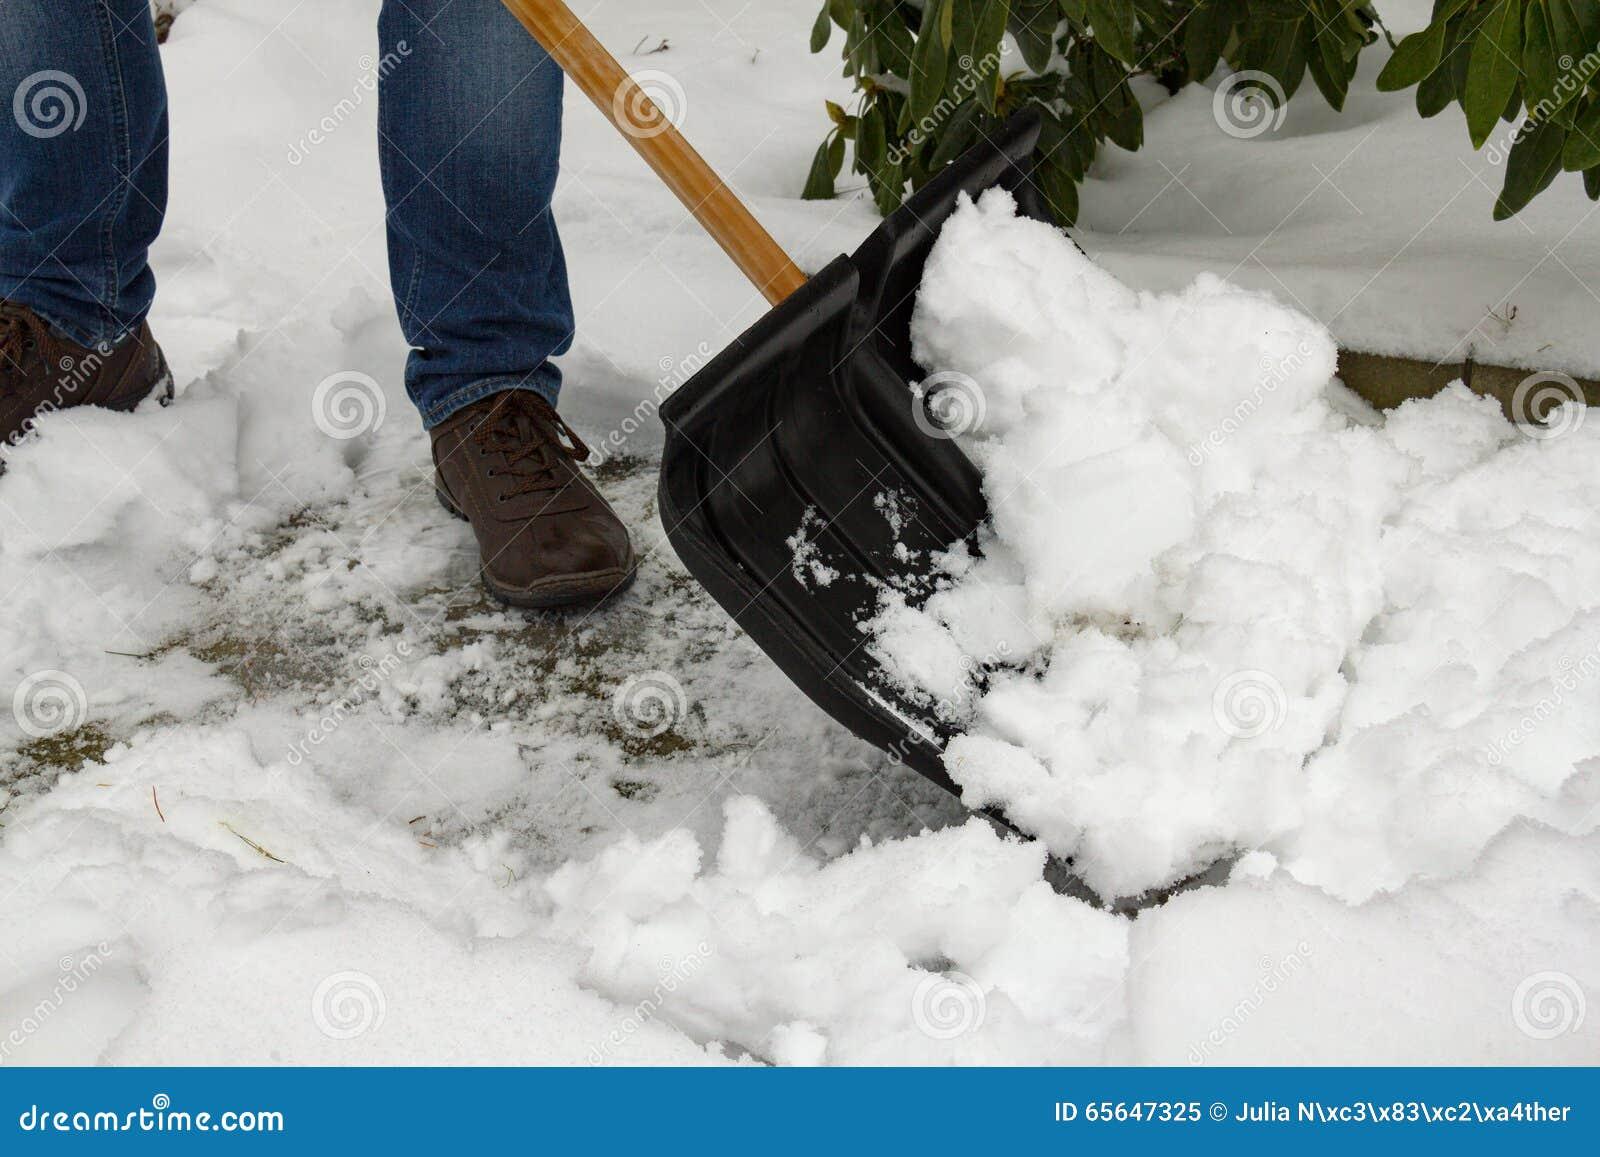 Homme avec le chasse-neige